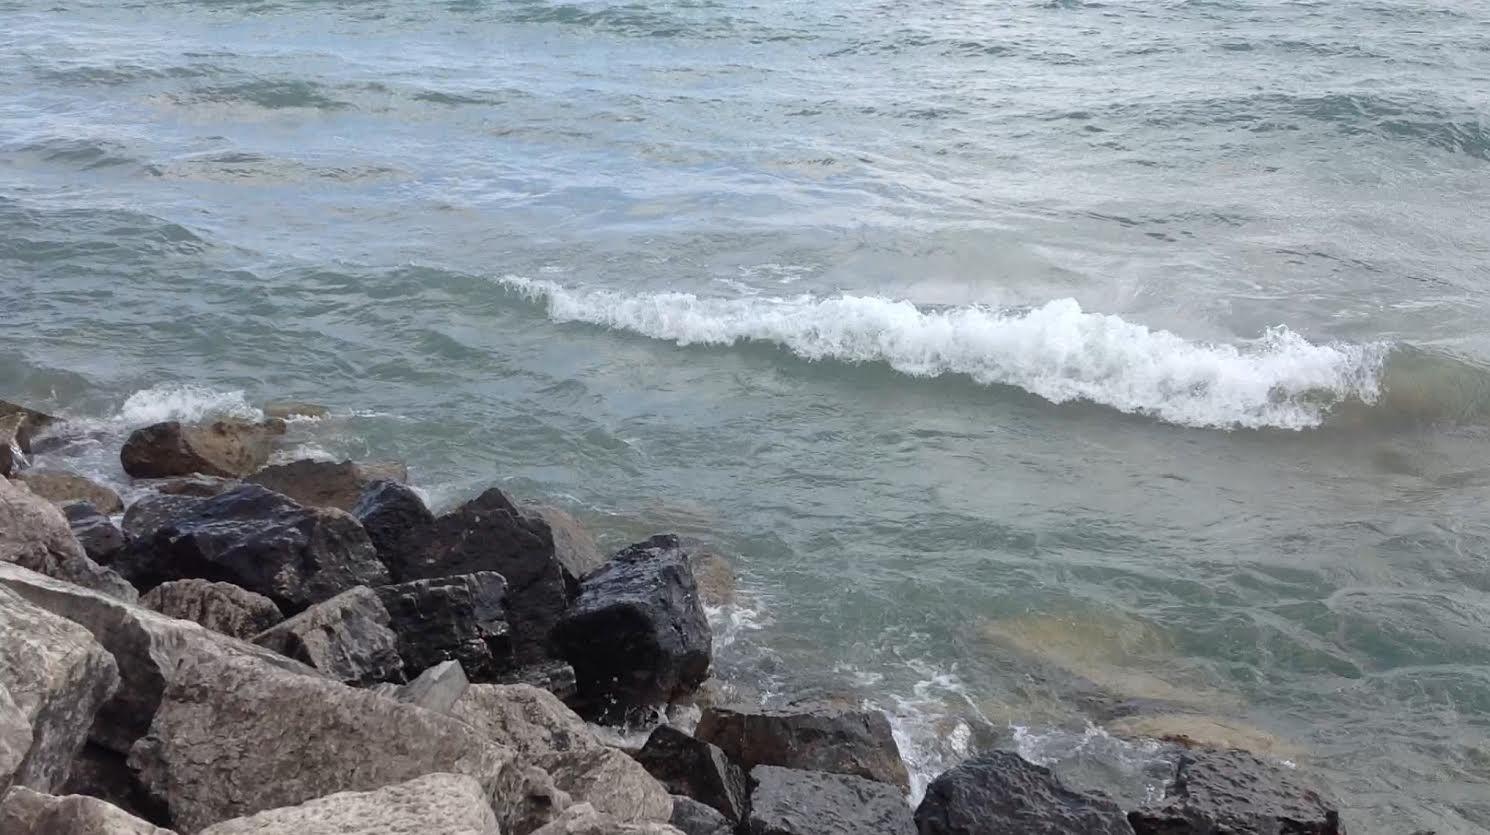 https://rochellewisofffields.files.wordpress.com/2016/05/waves.jpg